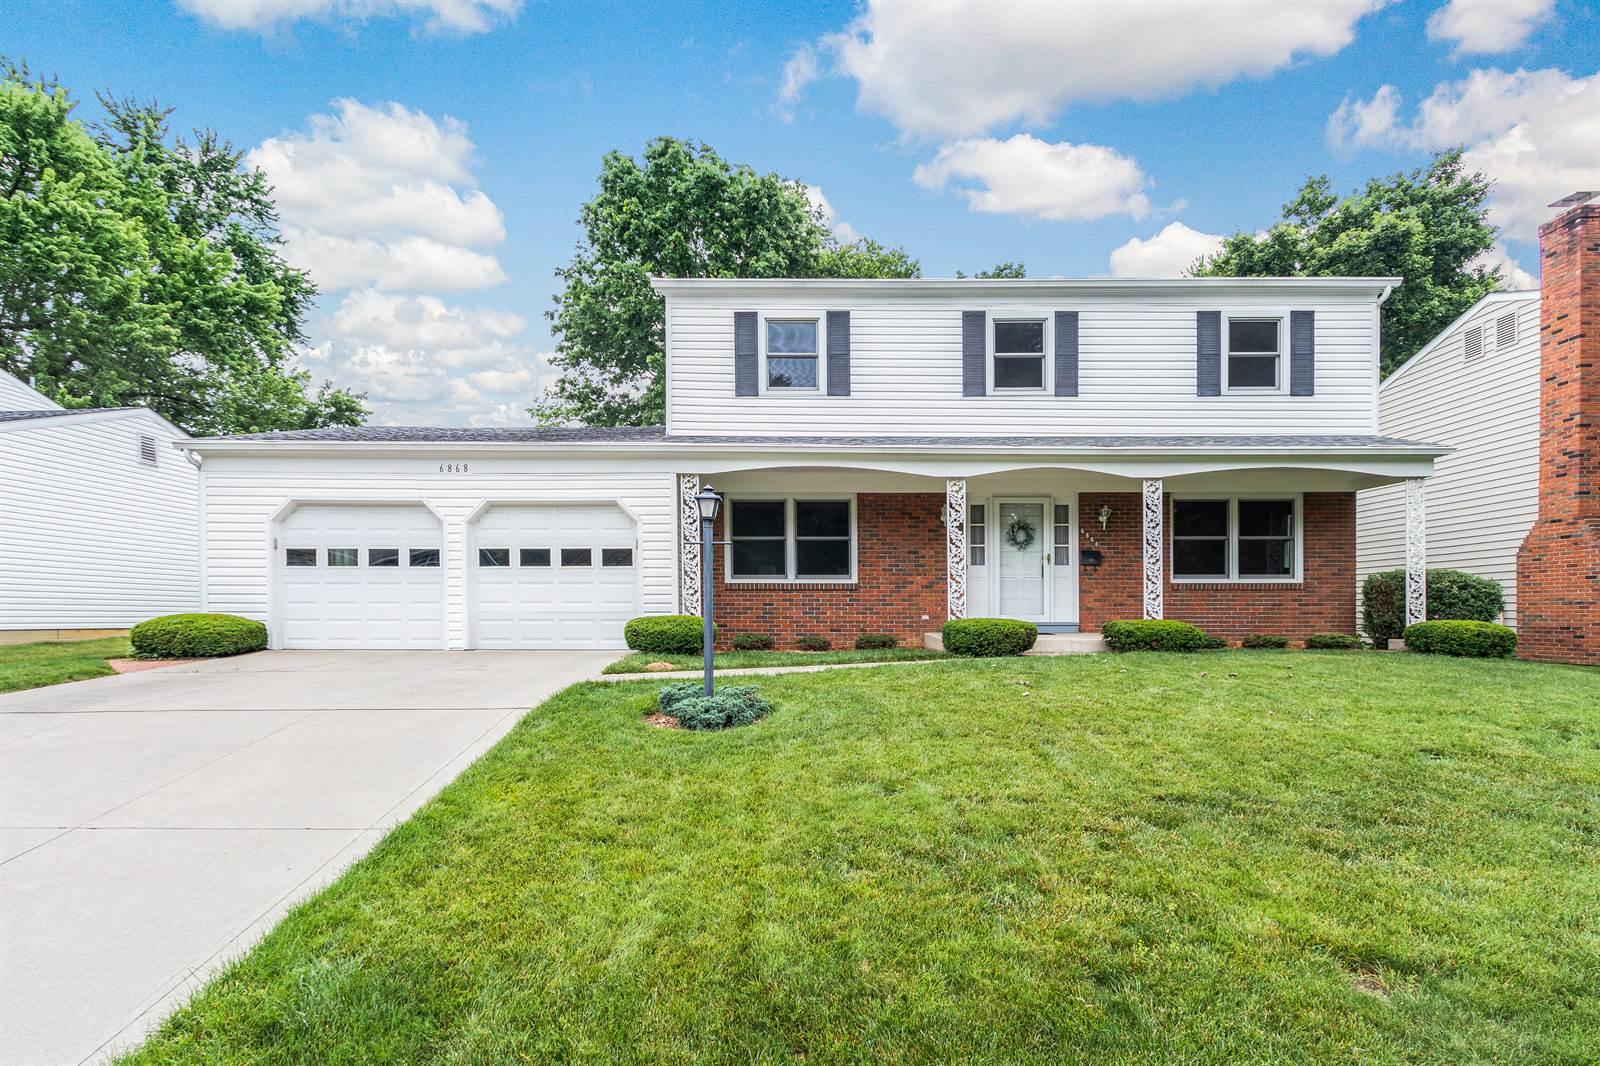 6868 Bowerman W, Worthington, OH 43085